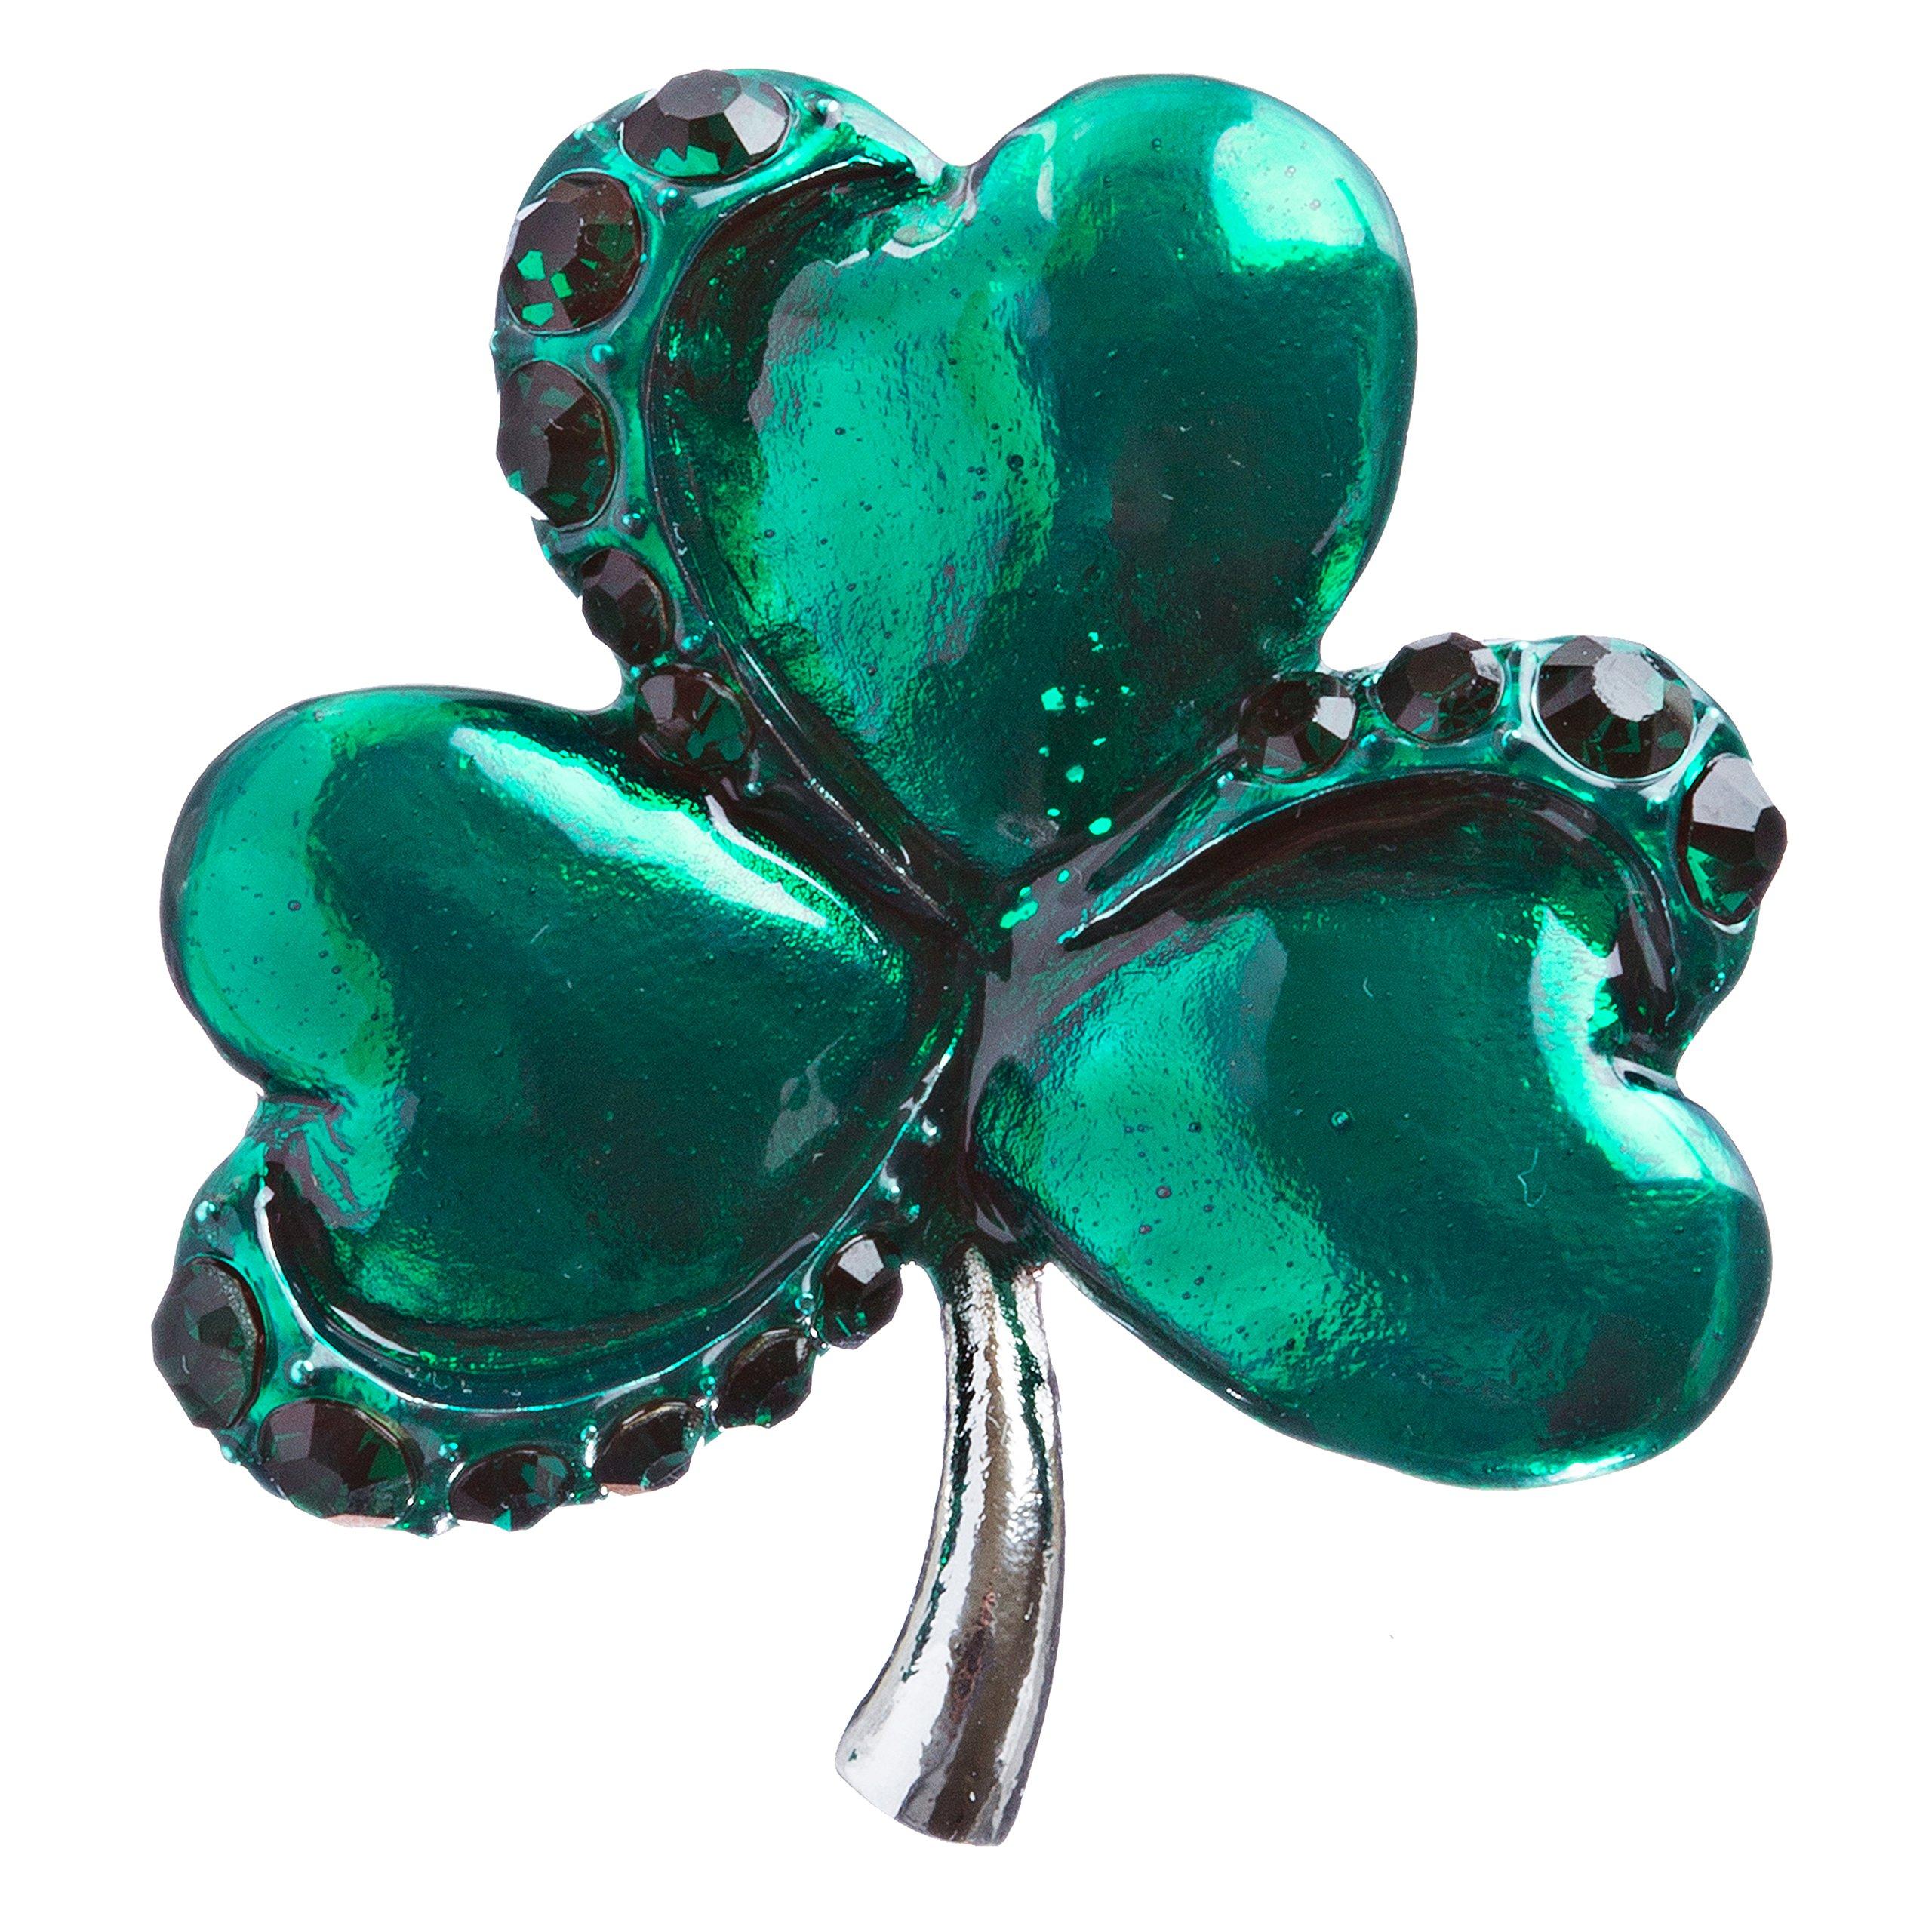 ACCESSORIESFOREVER Women St. Patrick's Day Jewelry Crystal Rhinestone Splendid Clover Leaf Brooch B160 SV